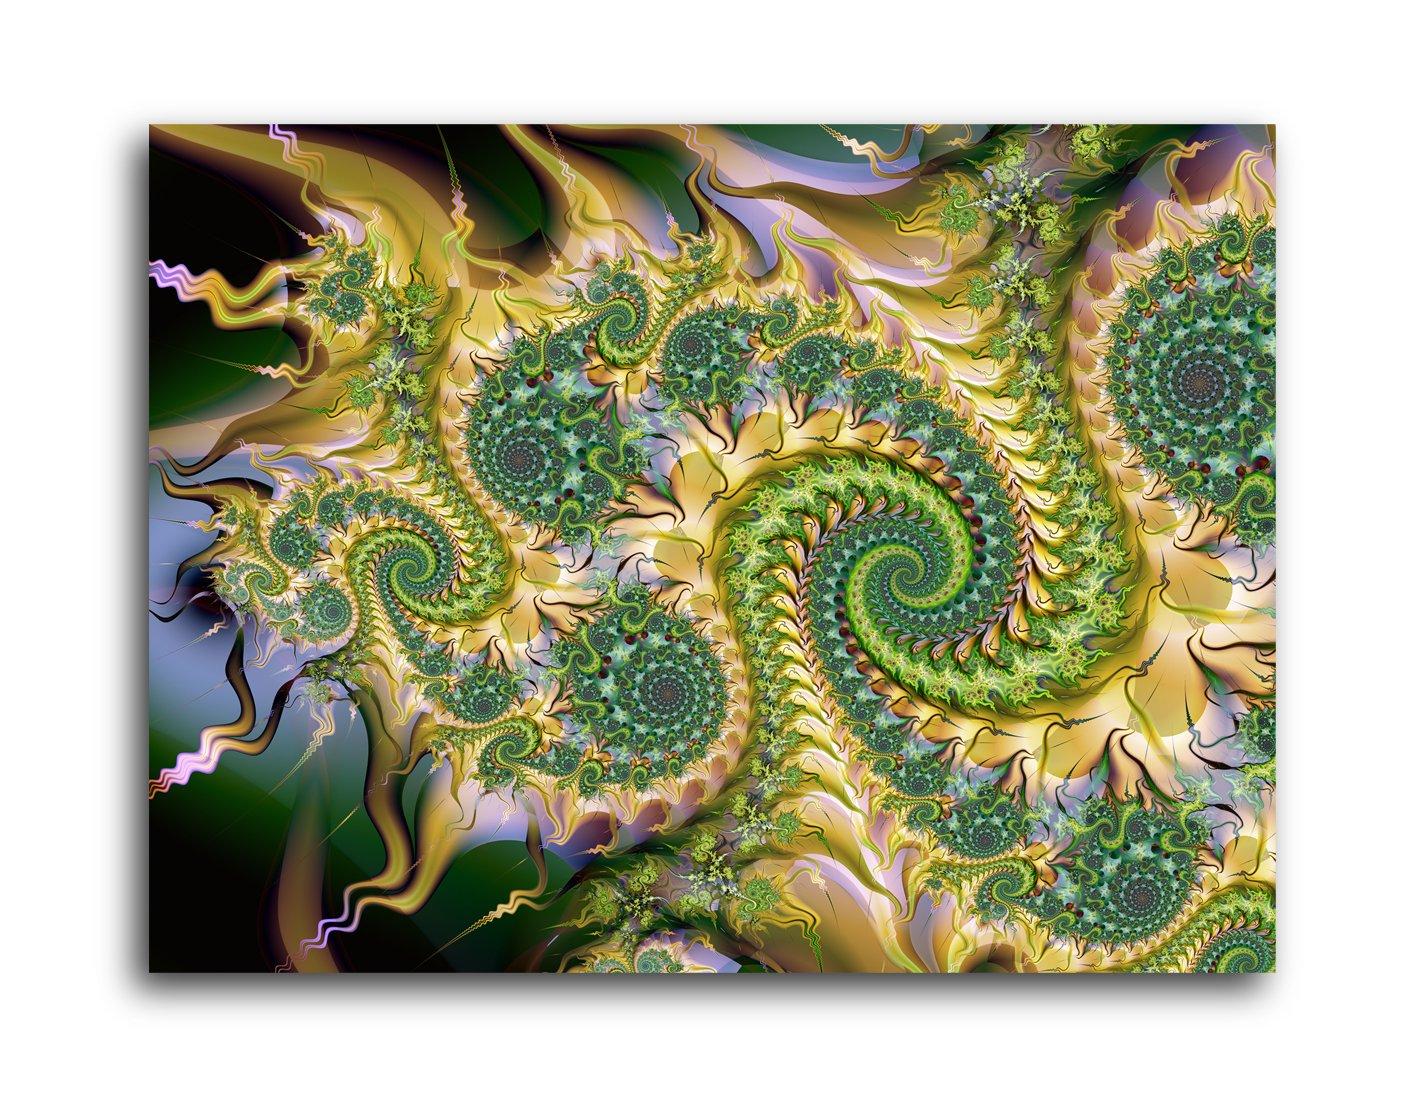 Amazon.com: Green Fractal Spirals Abstract Art Brushed Aluminum ...